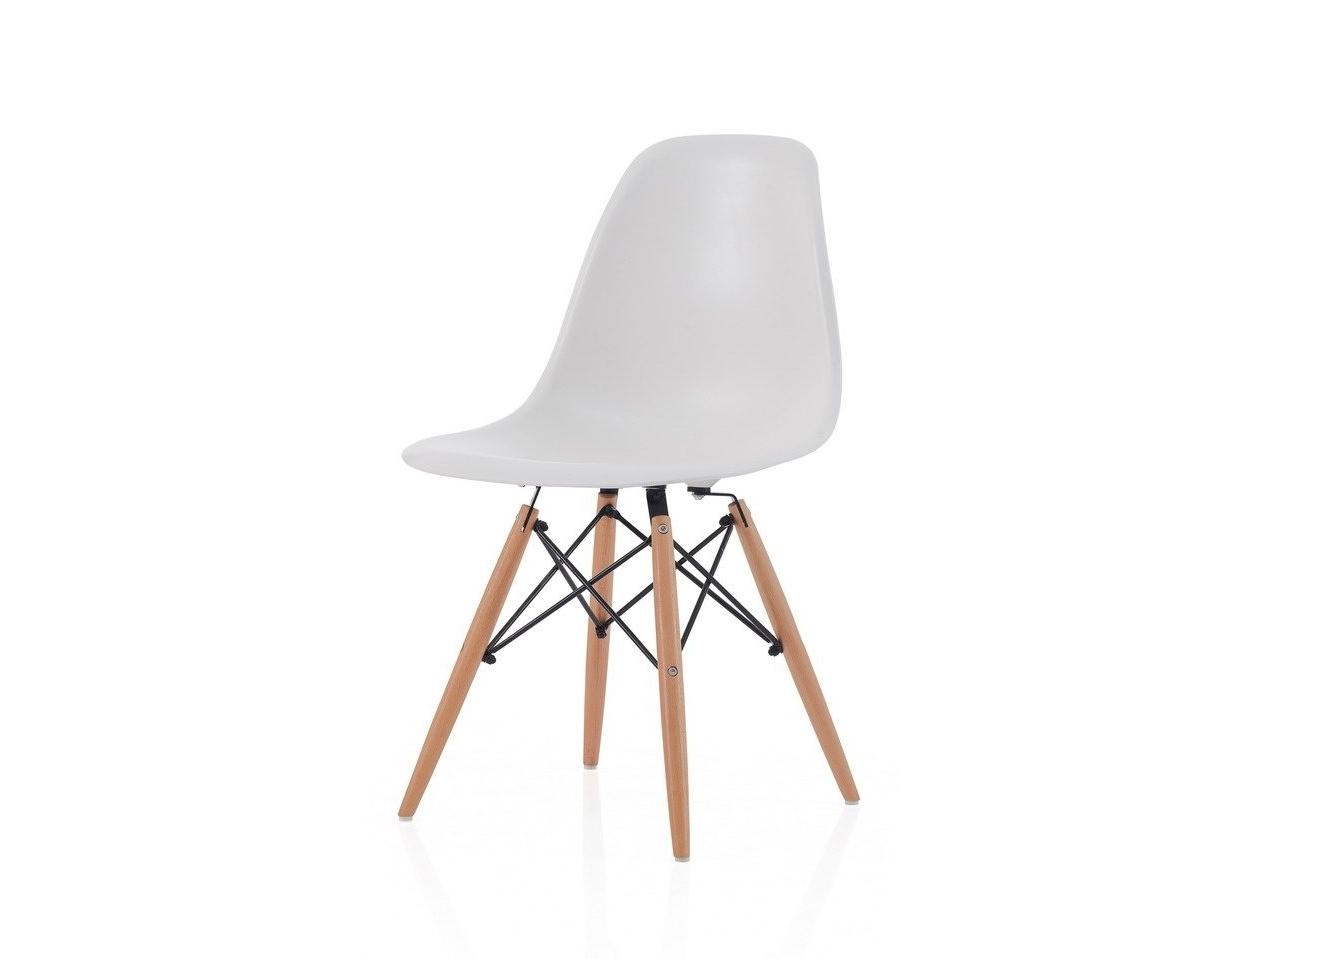 Стул Y-971 белыйОбеденные стулья<br>Материал: Пластик, дерево<br><br>Material: Пластик<br>Ширина см: 55<br>Высота см: 82<br>Глубина см: 46